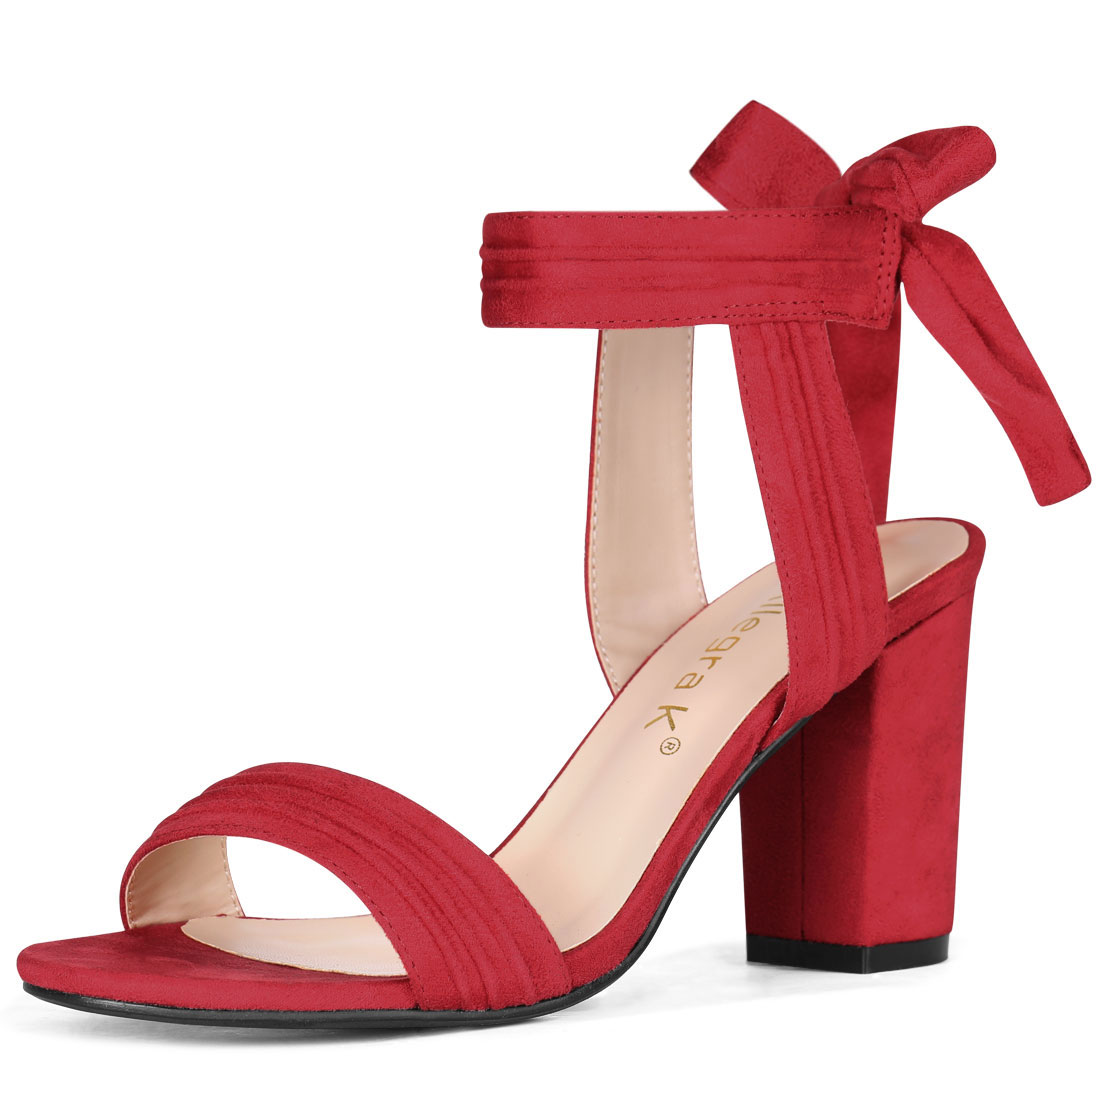 Allegra K Women's Open Toe Ankle Tie Back Chunky Heel Sandals Red US 8